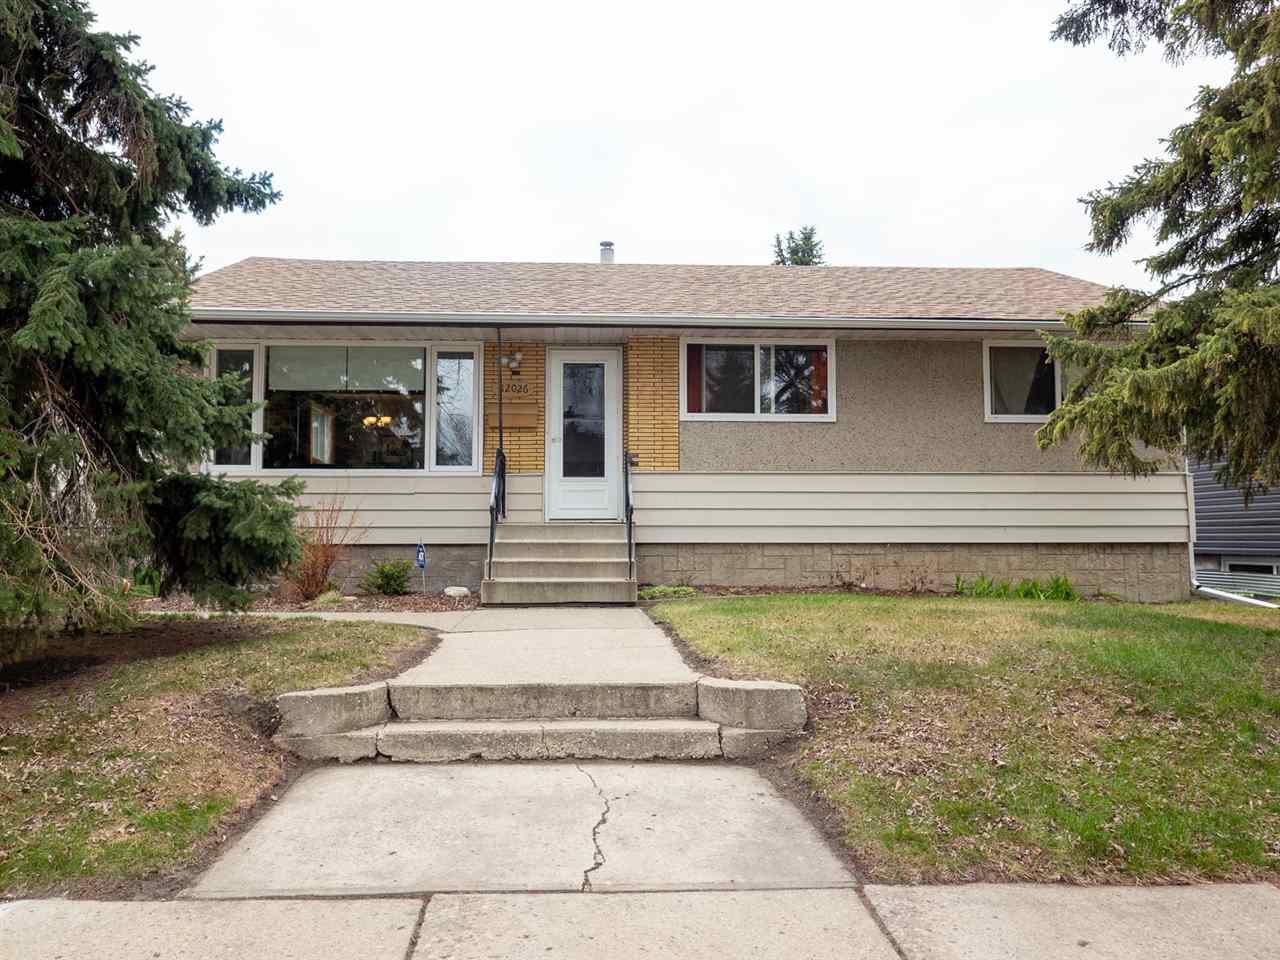 Main Photo: 12026 38 Street in Edmonton: Zone 23 House for sale : MLS®# E4155557